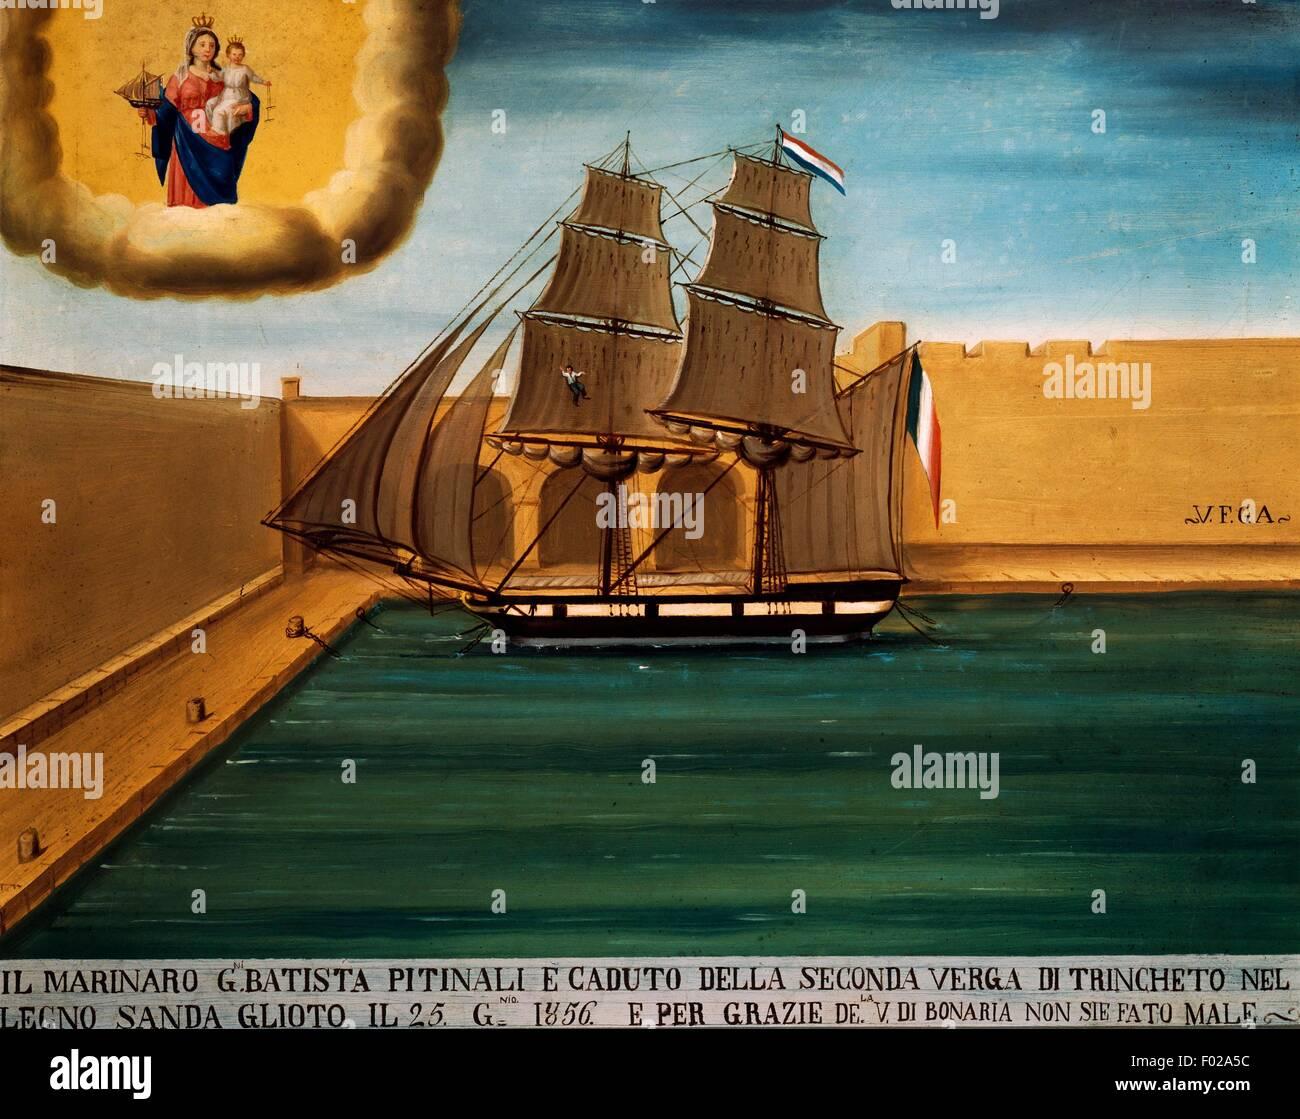 Tall Ship, seafaring ex voto, Italy, 1856. - Stock Image